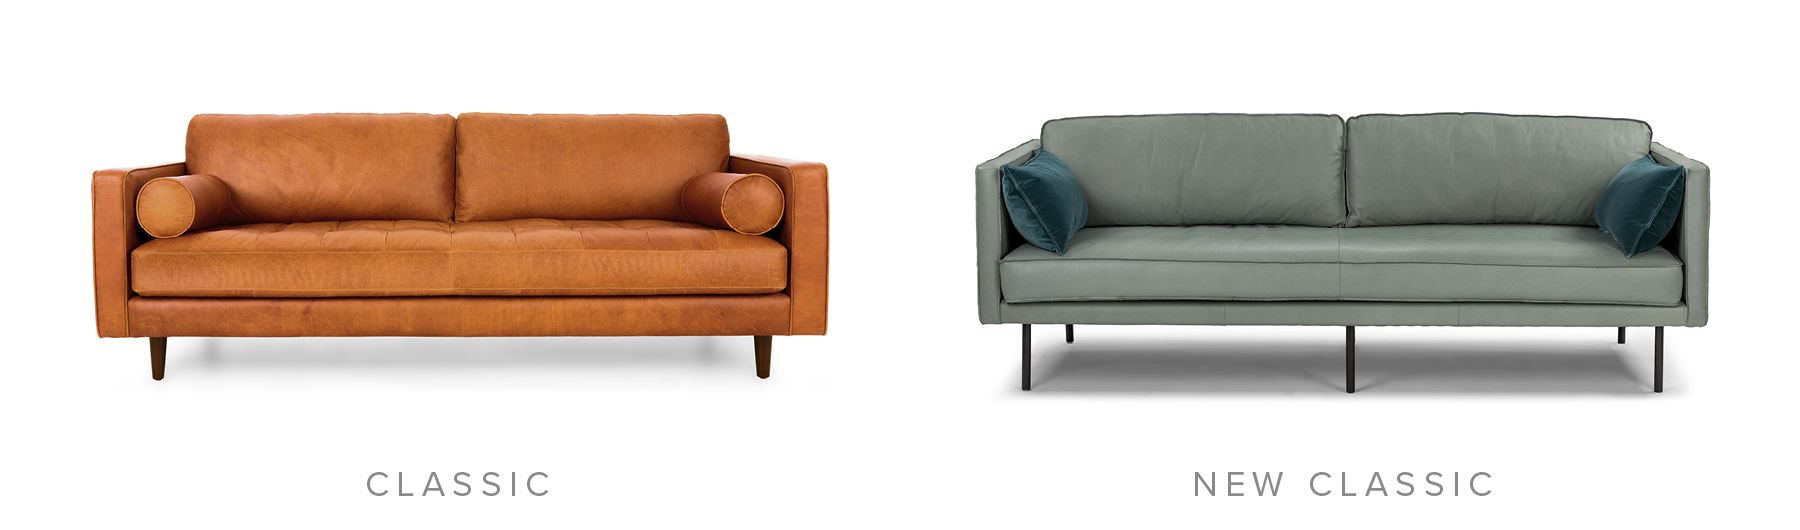 Classic: Sven Charme Tan Sofa. New Classic: Capilano Charme Jasper Sofa